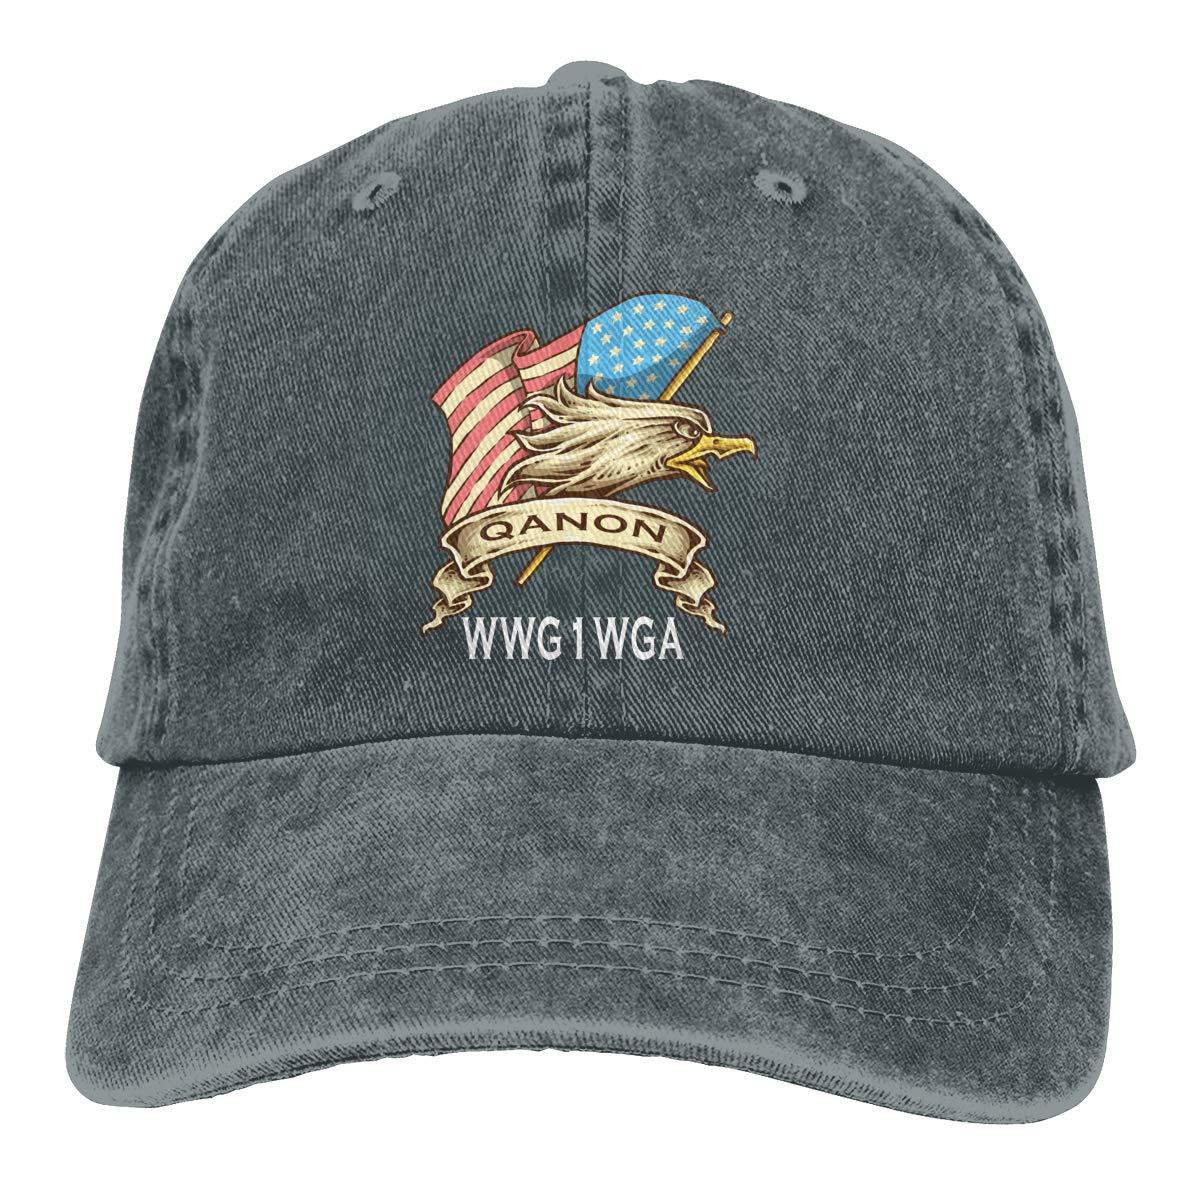 QAnon American Flag Eagle Q Anon WWG1WGA Fashion Adjustable Cowboy Cap Denim Hat for Women and Men